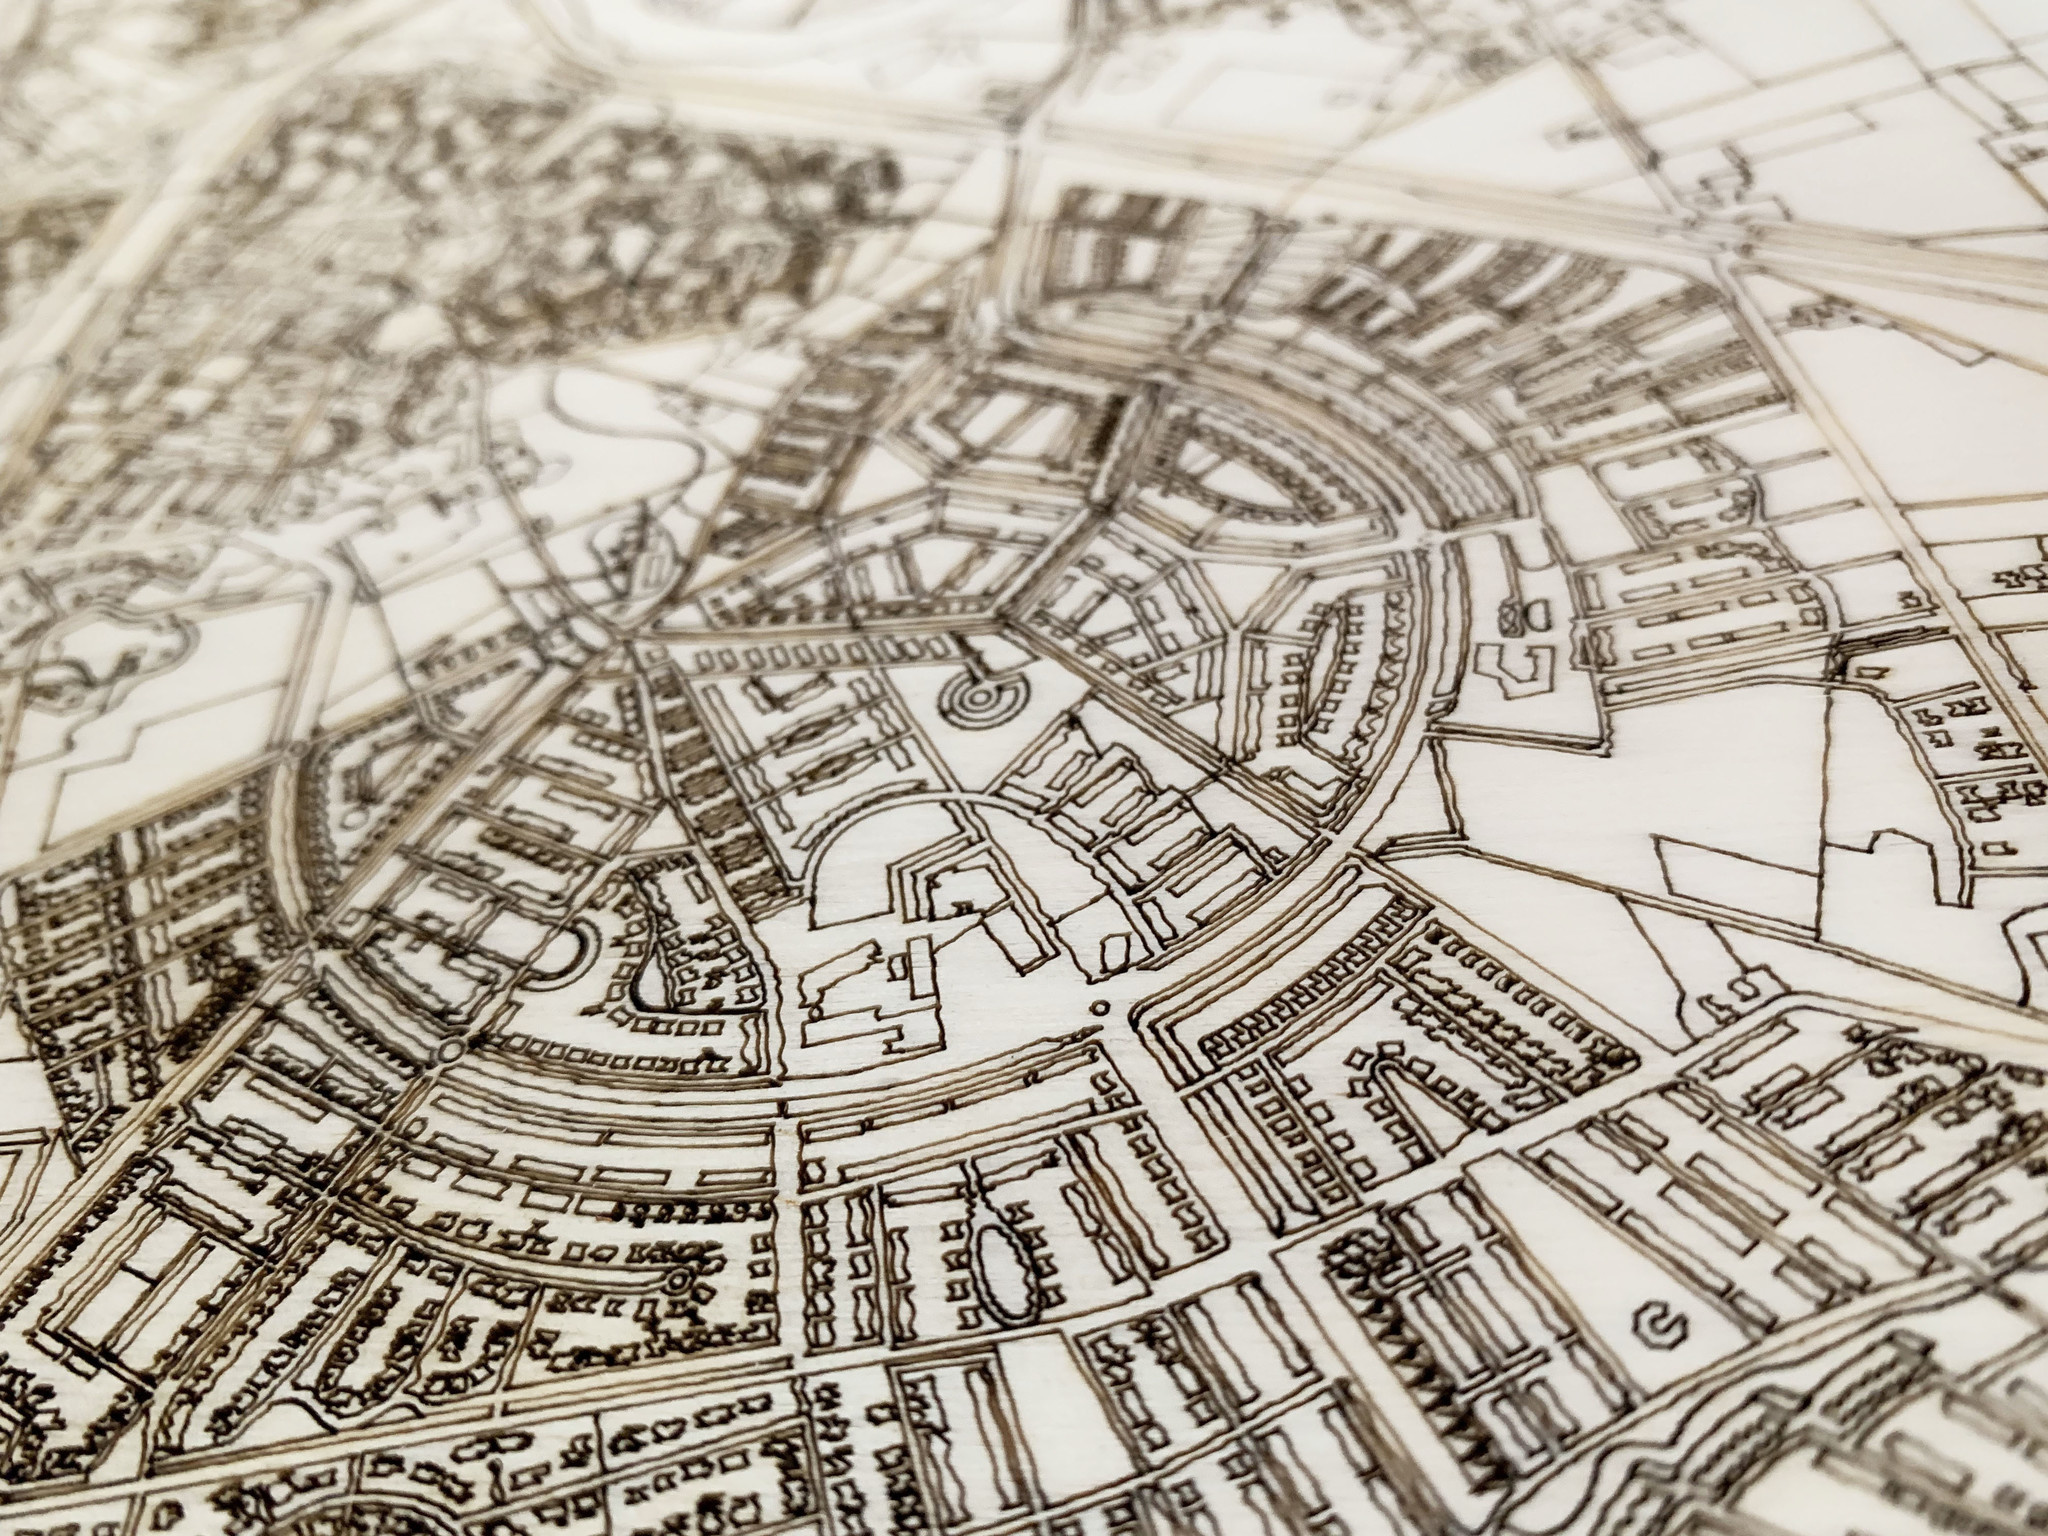 Citymap Dokkum | houten wanddecoratie-4